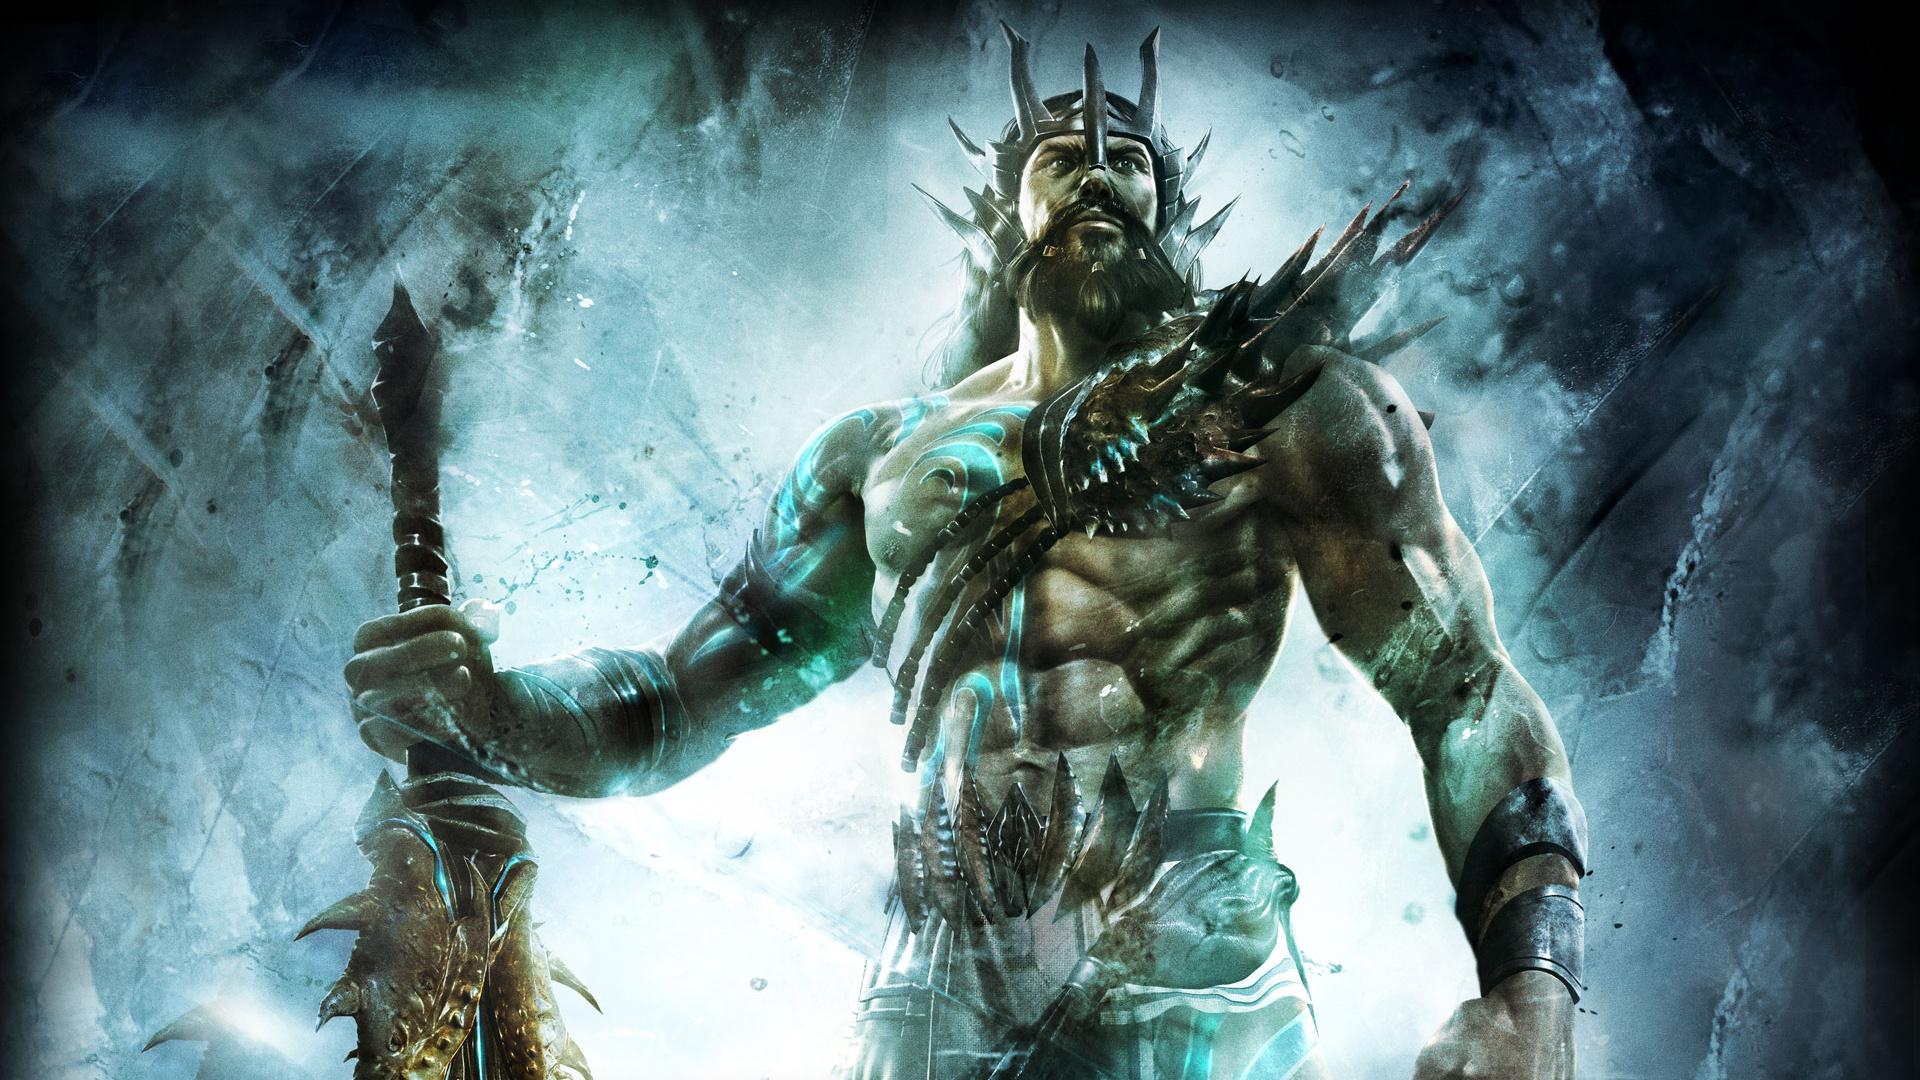 god of war backgrounds A4